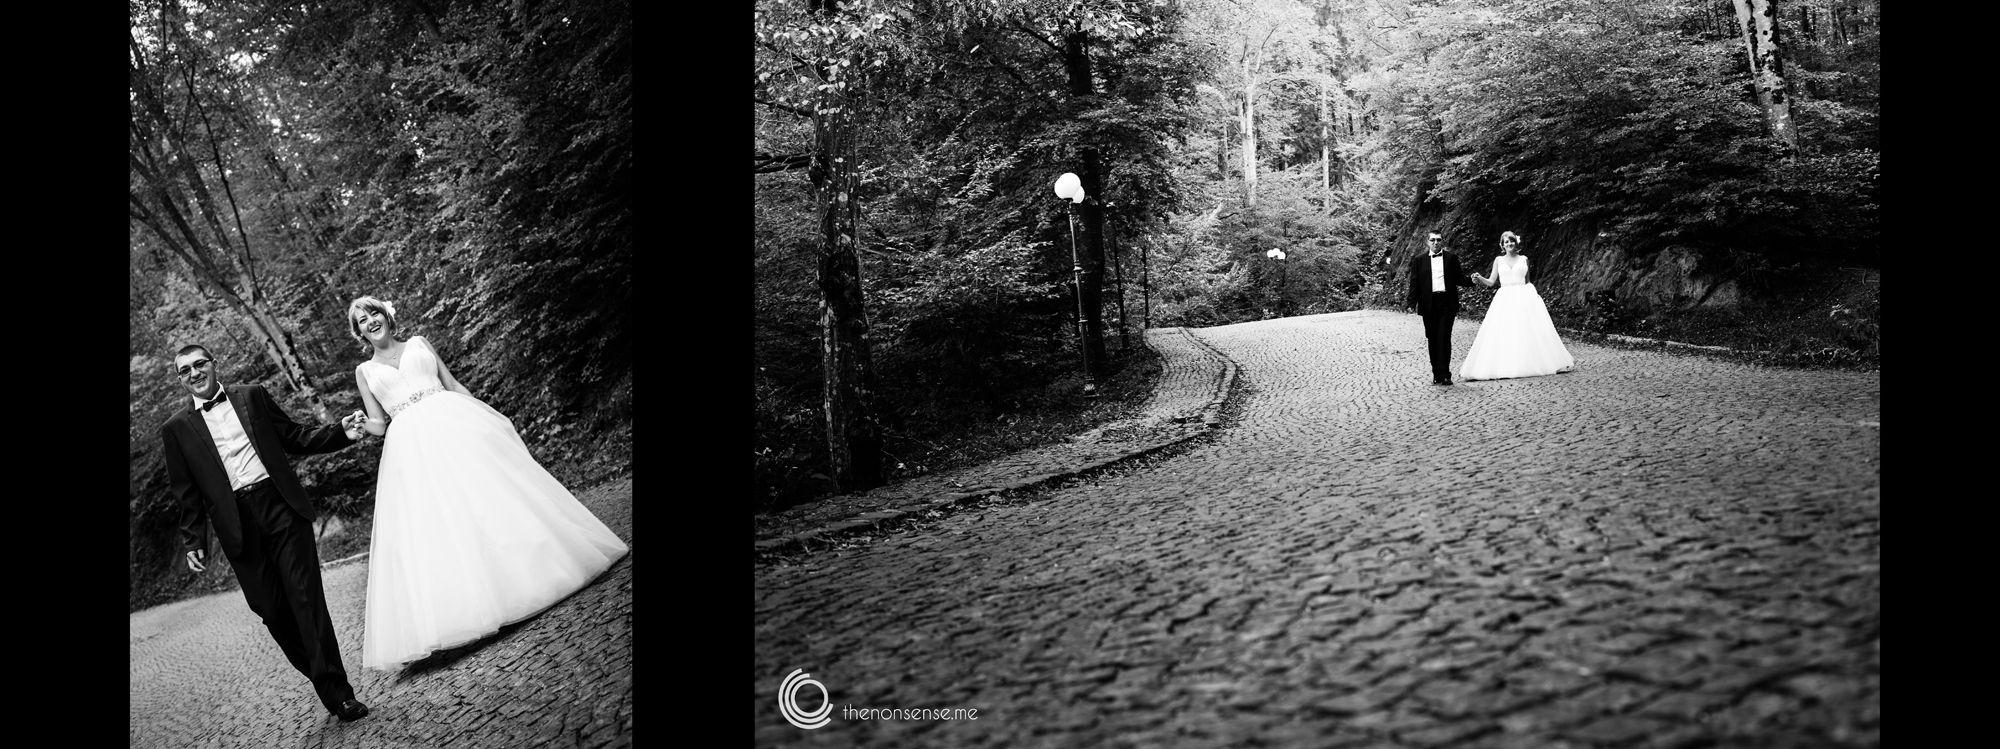 Copyright © 2014 by Larisa Suler – http://www.thenonsense.me